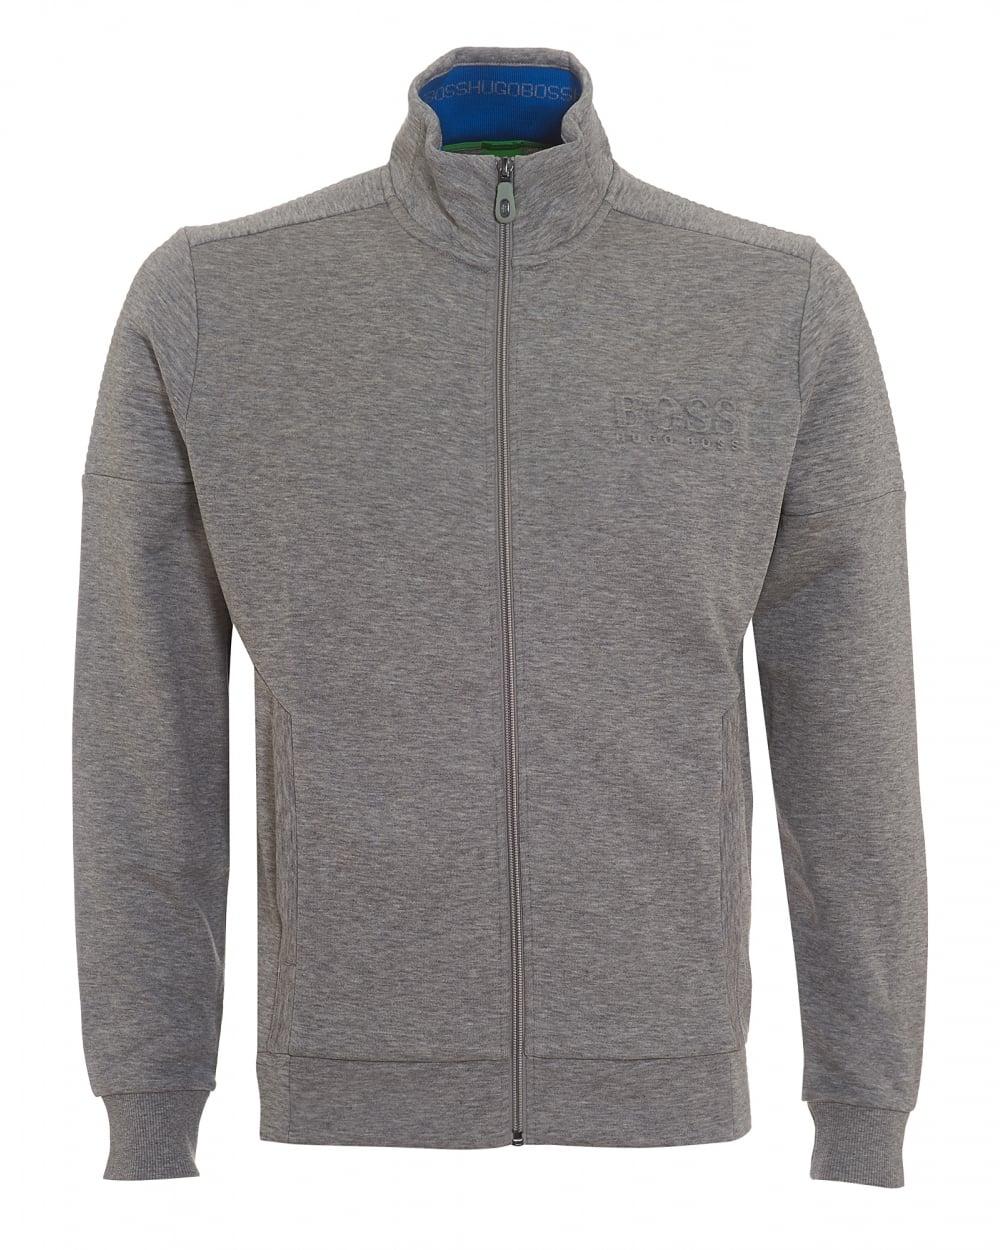 133fa3e873fa5 Hugo Boss Green Skaz 001 Jacket - Clothing from Cartel Menswear ltd UK. hugo  boss skaz